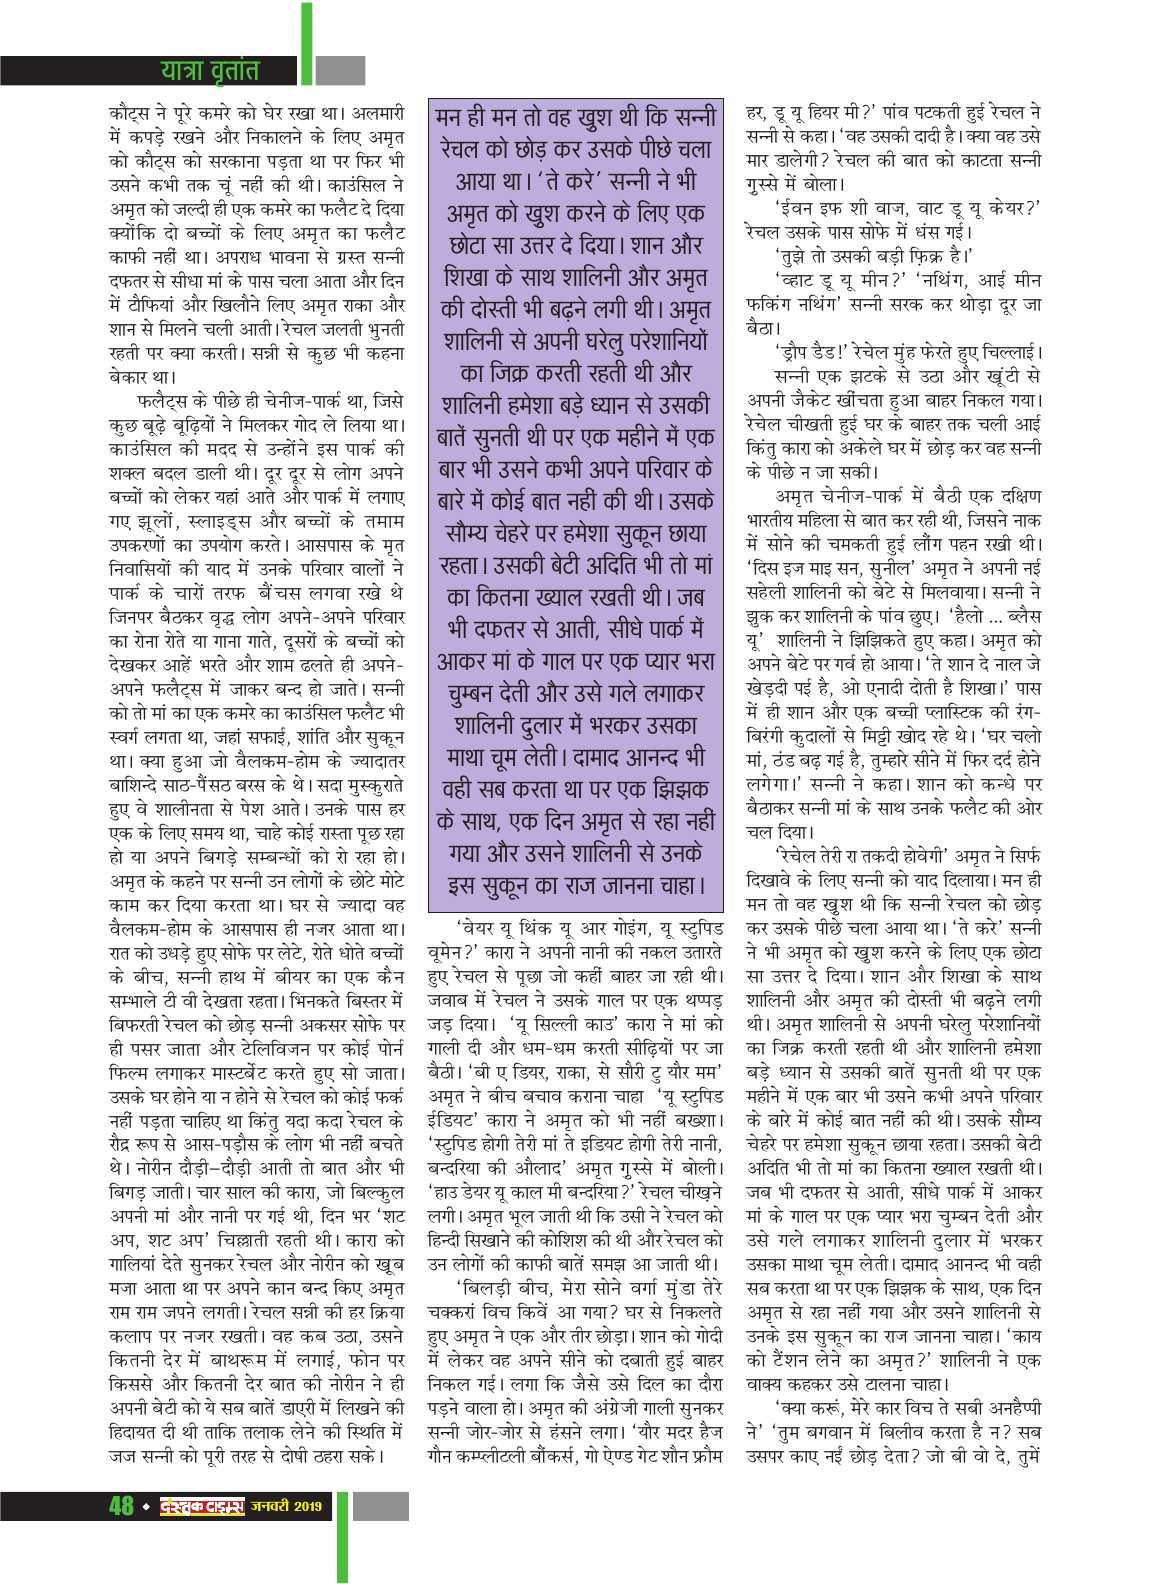 Dastak Times for E-Magazine 15 Jan 2019 new50